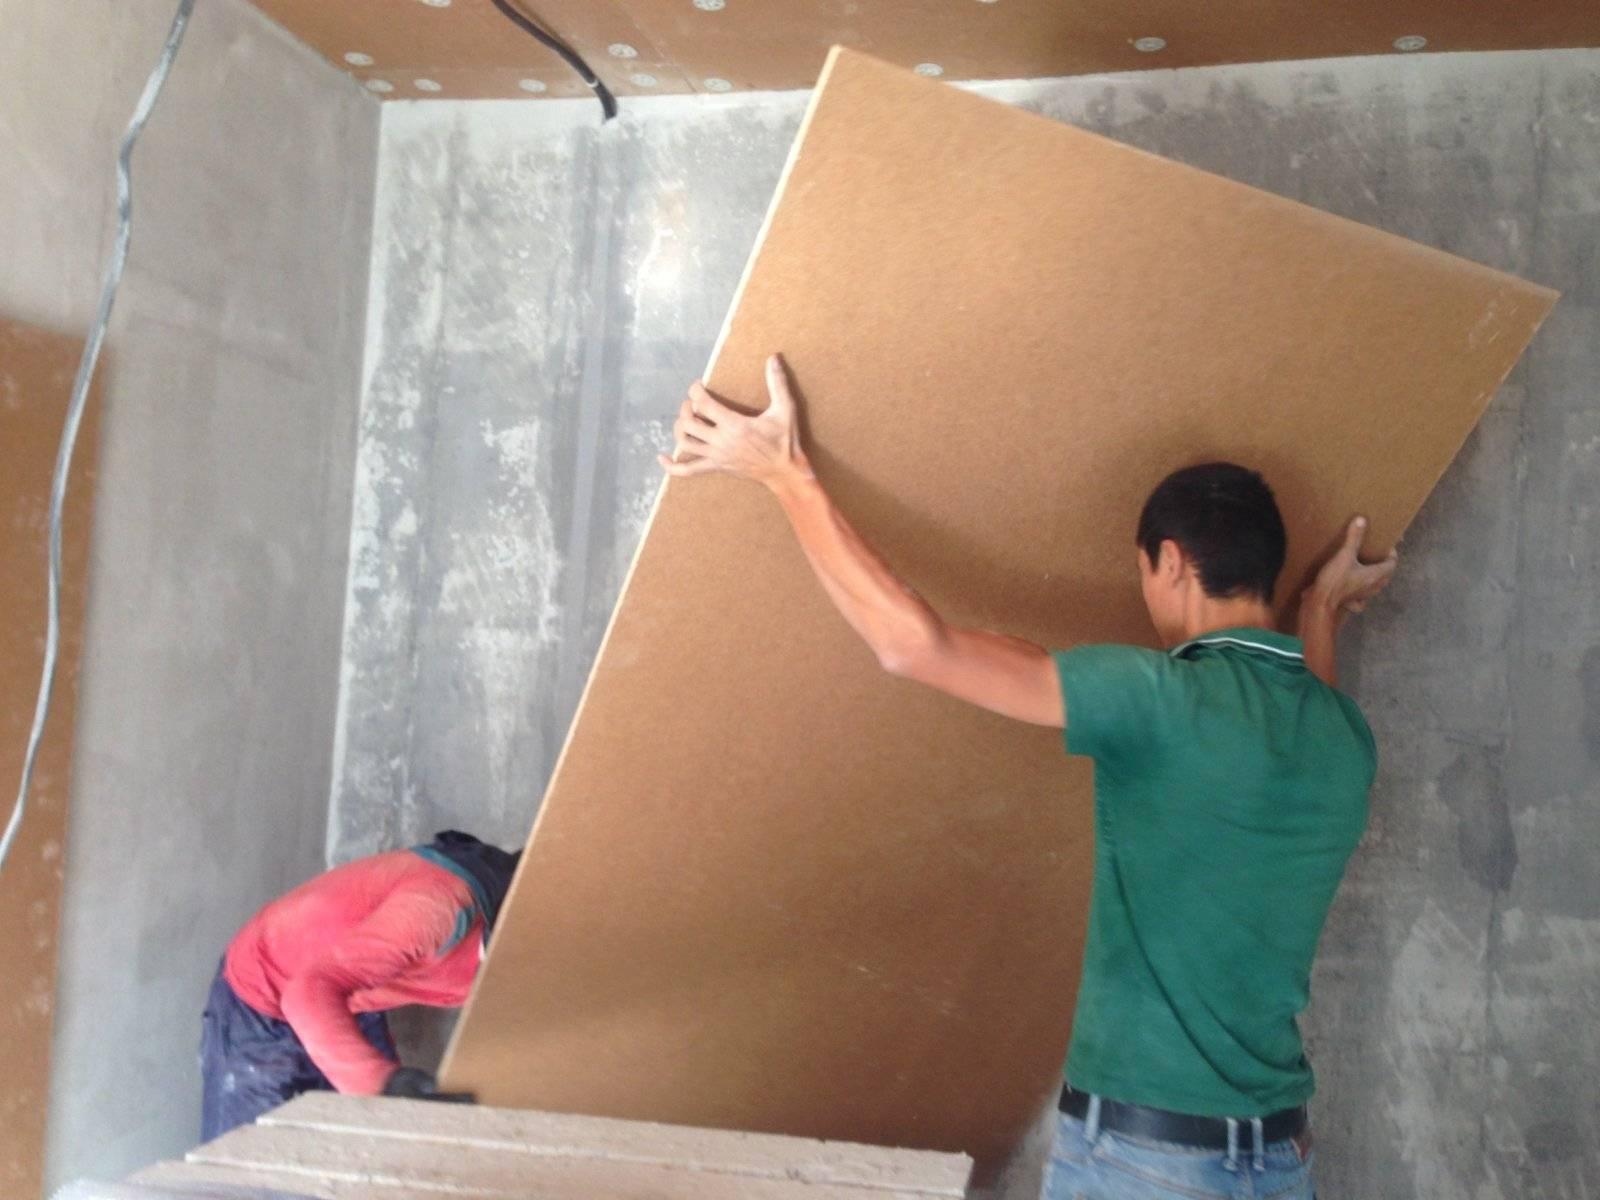 Шумоизоляция квартиры без ремонта. обзор решений снижения шума